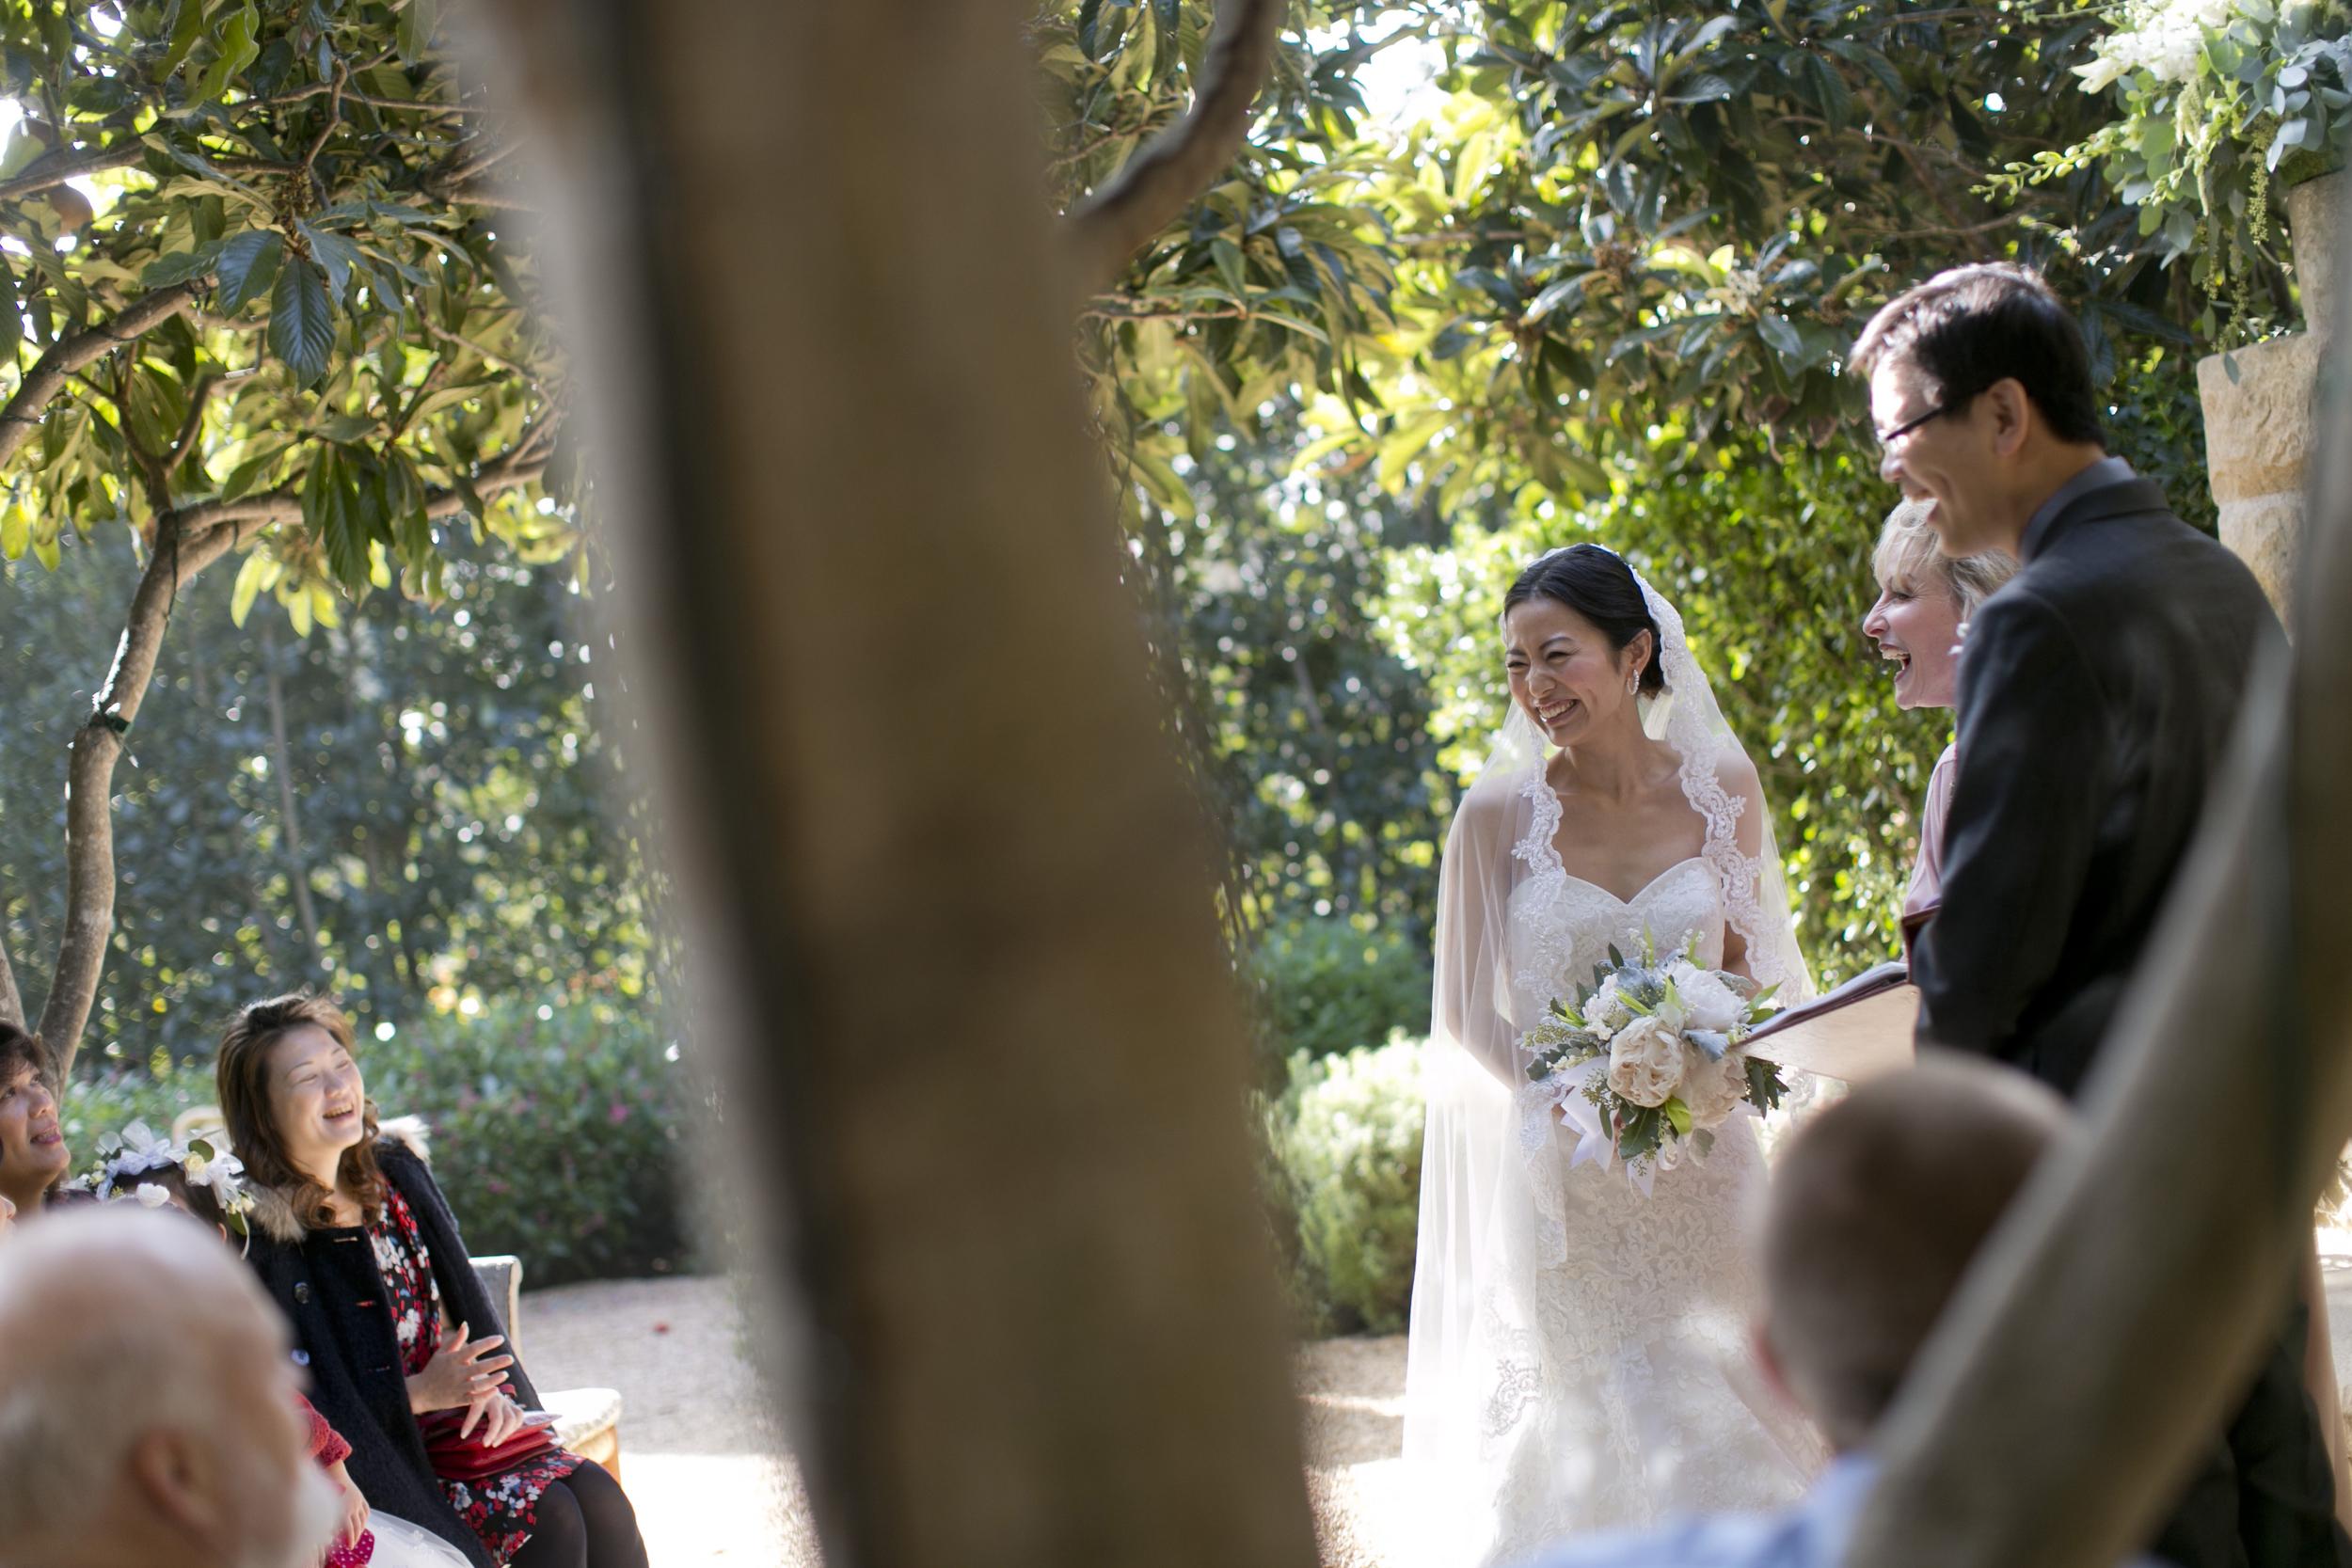 Santa Barbara Wedding Officiant | Miriam Lindbeck | Non-Denominational Minister Serving Southern California